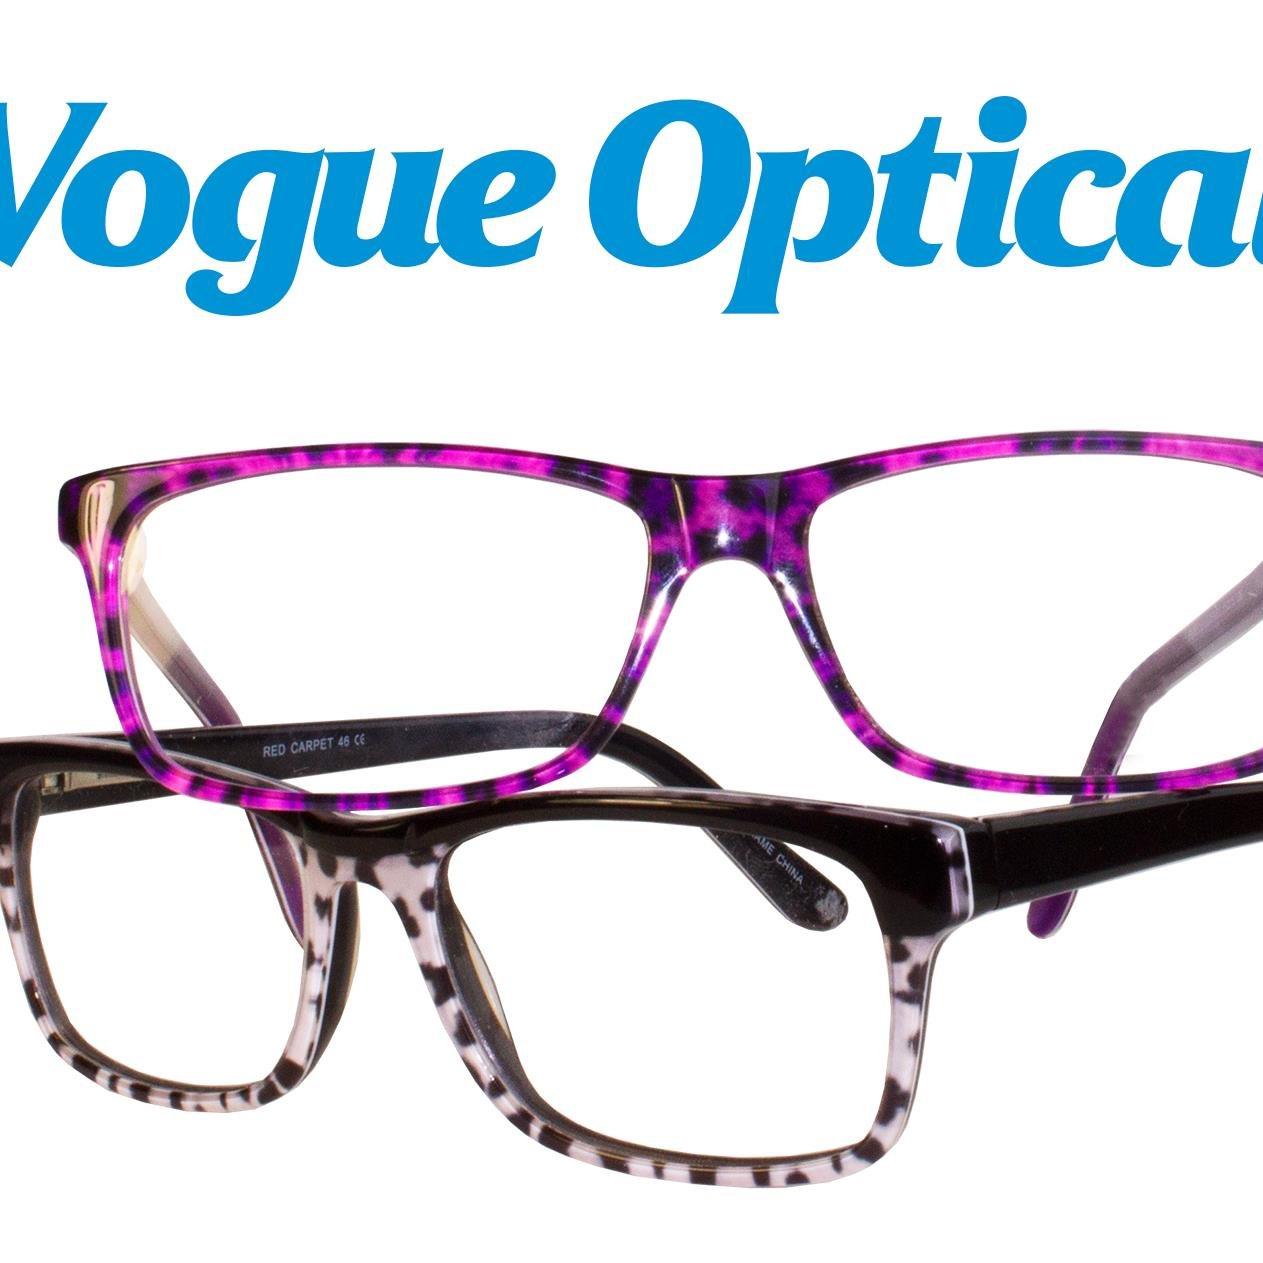 296298b6e28 Vogue Optical ( VogueOptical)